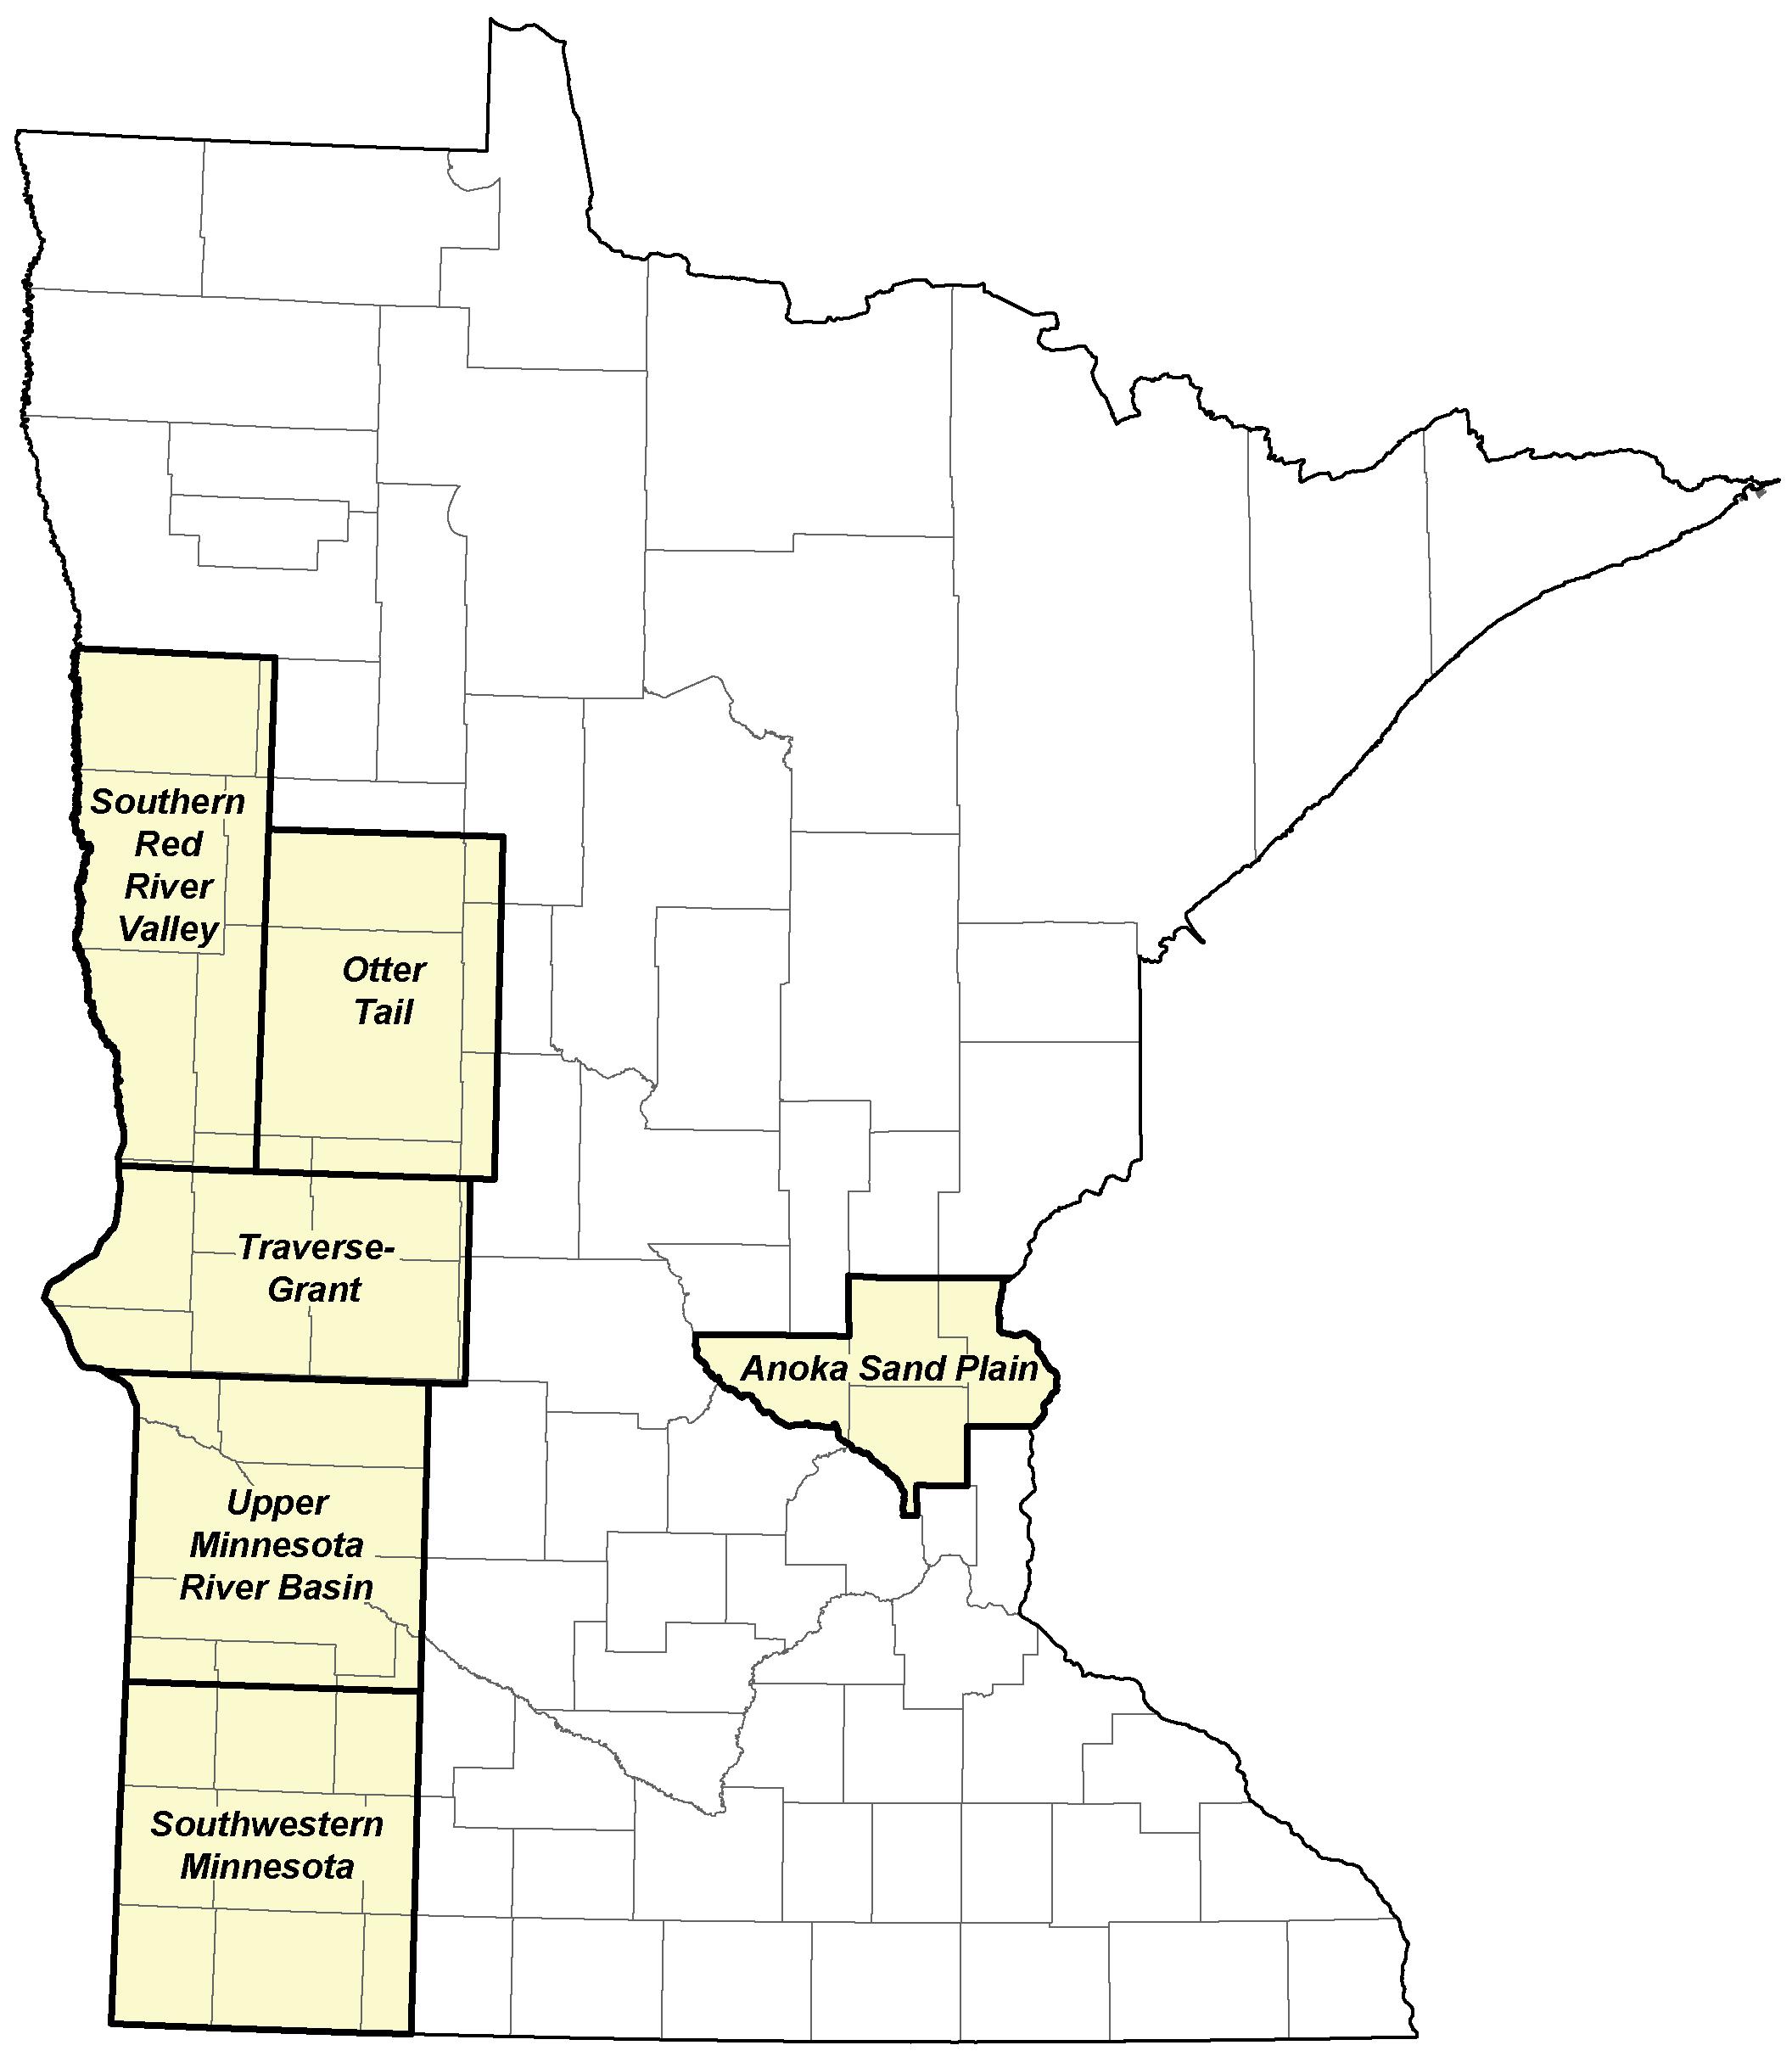 Minnesota map of hydrogeologic assessment areas